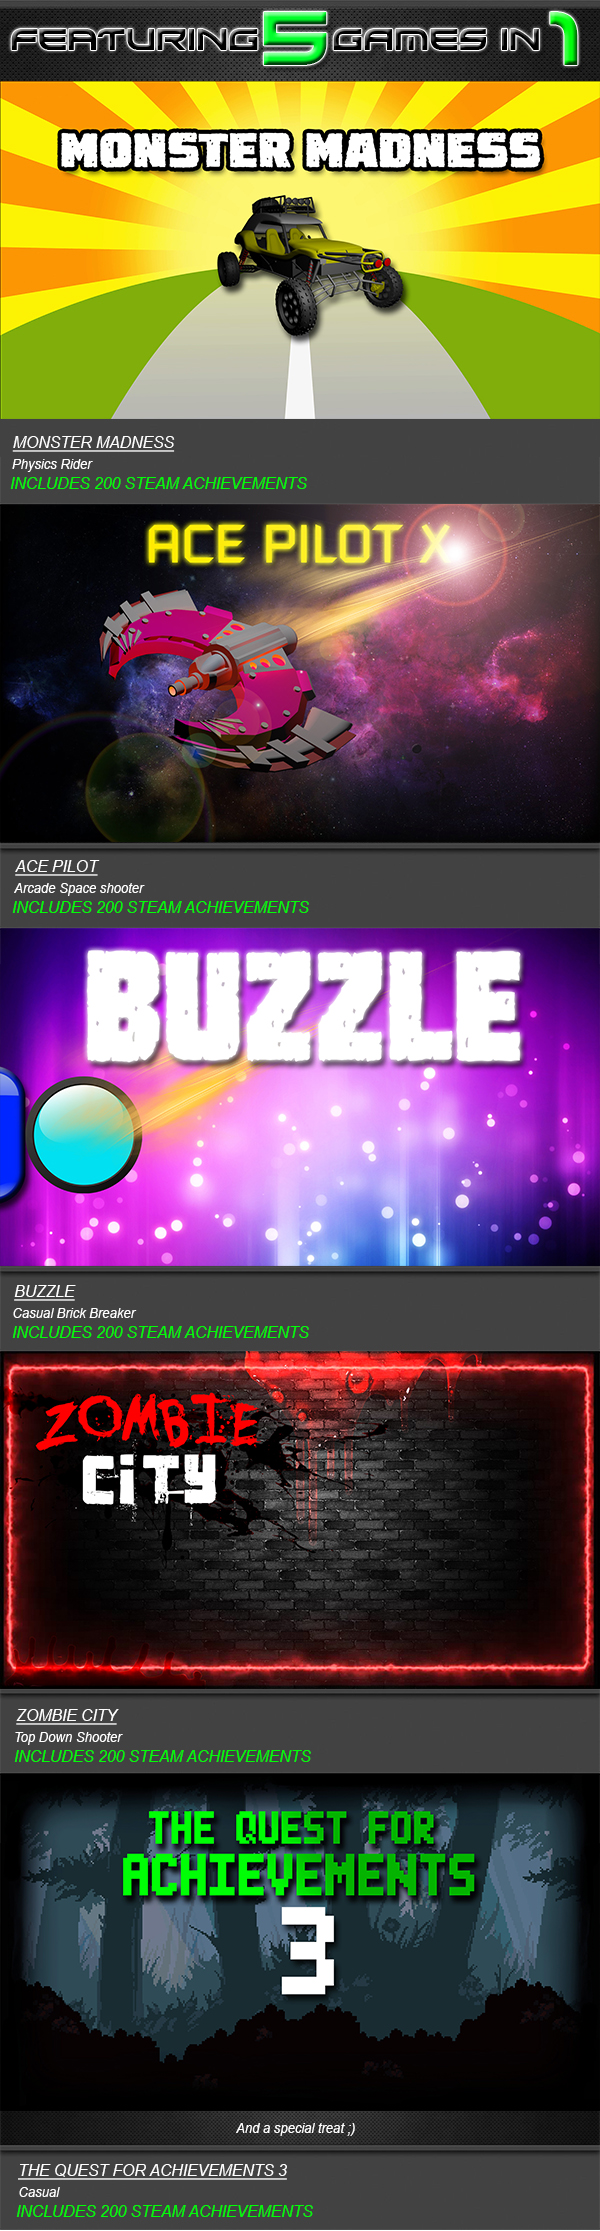 buzzle dating simulator